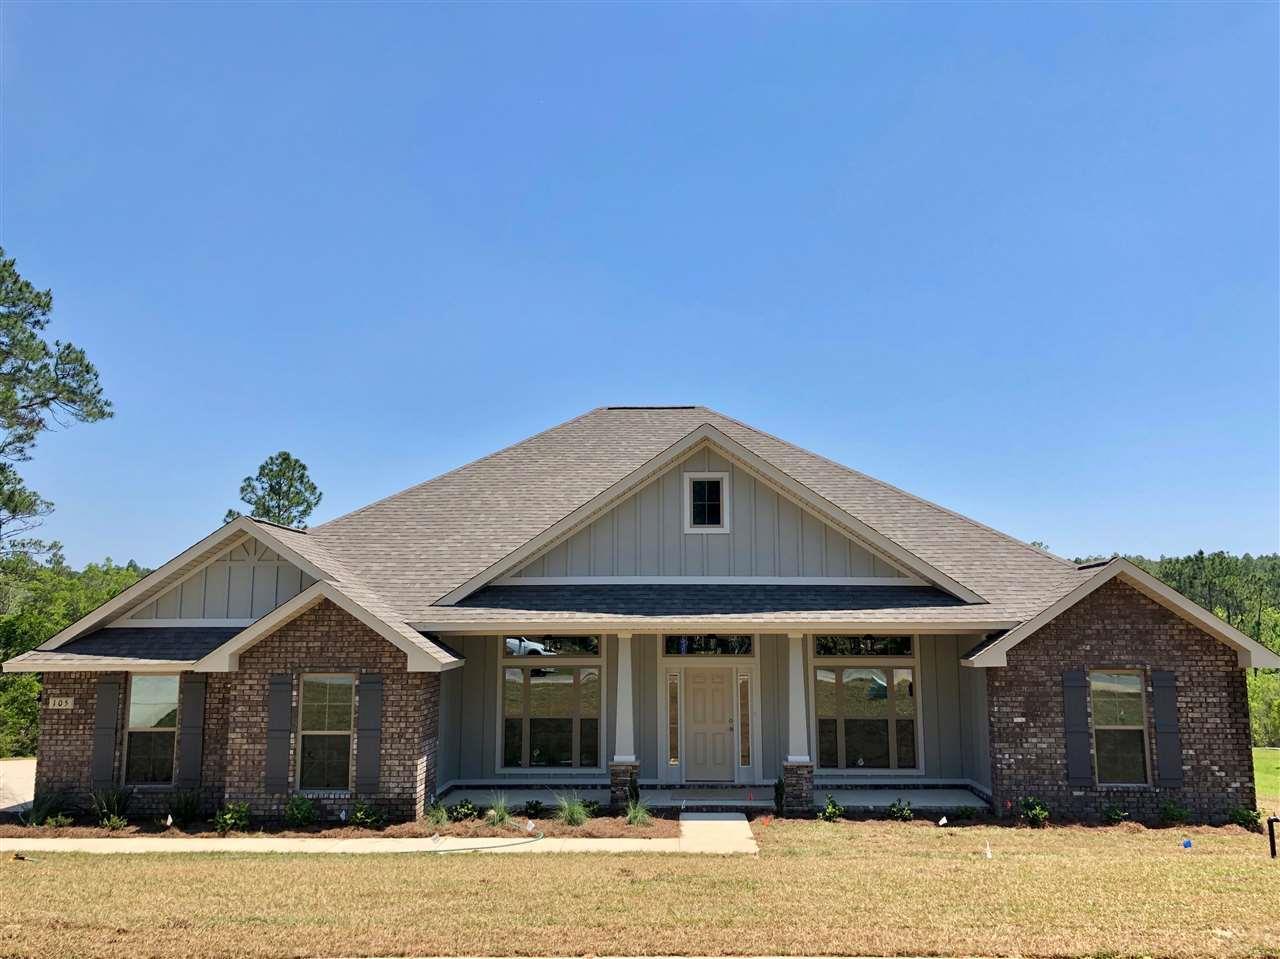 105 Leonine Hollow, Crestview, FL 32536